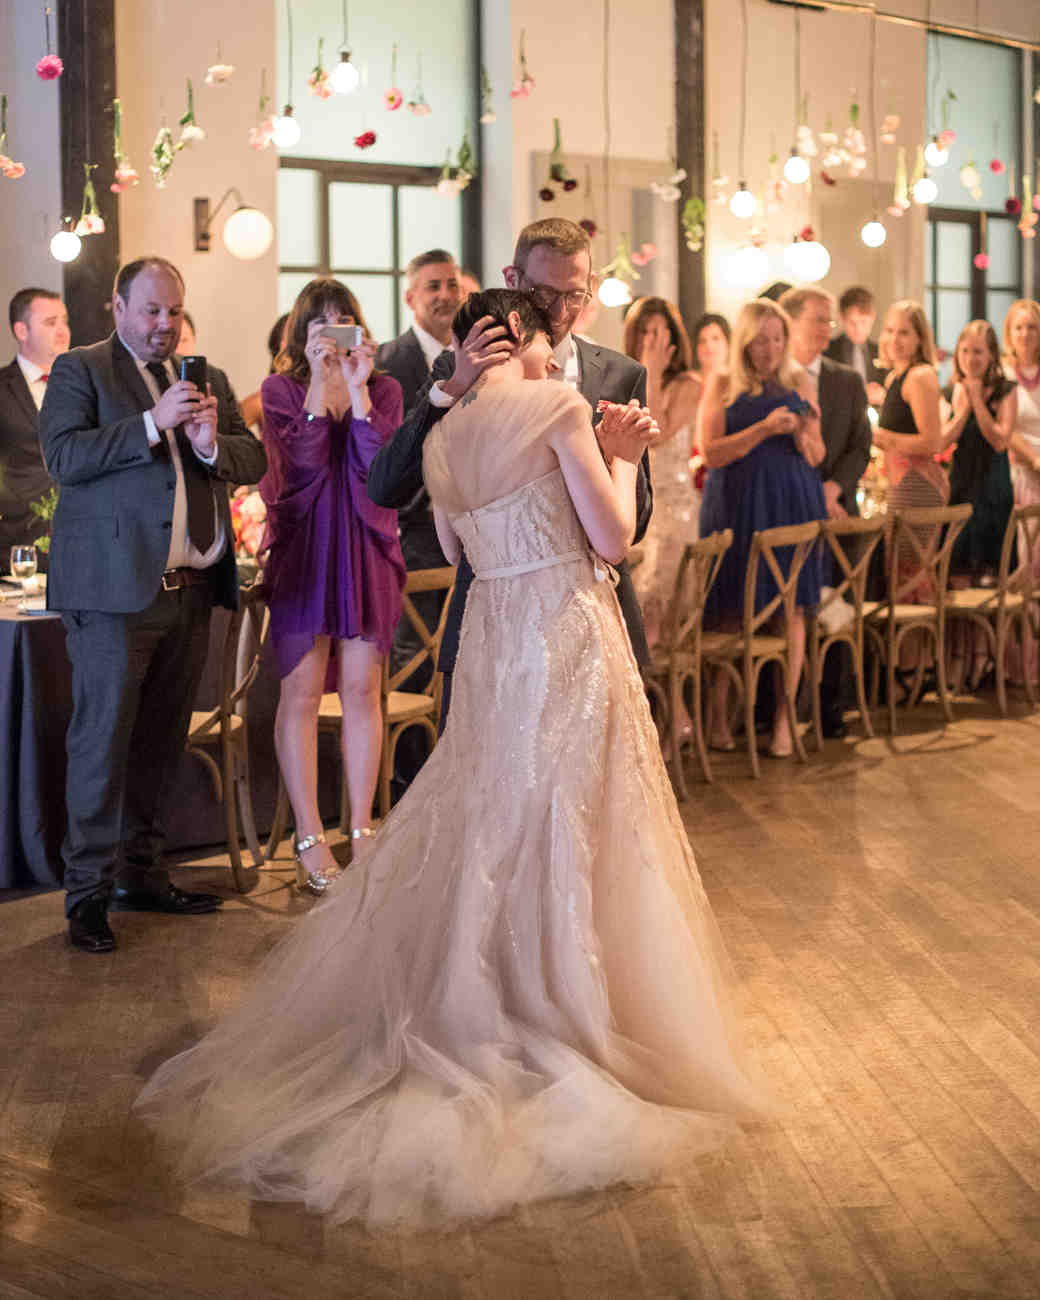 caitlin-michael-wedding-dance-489-s111835-0415.jpg